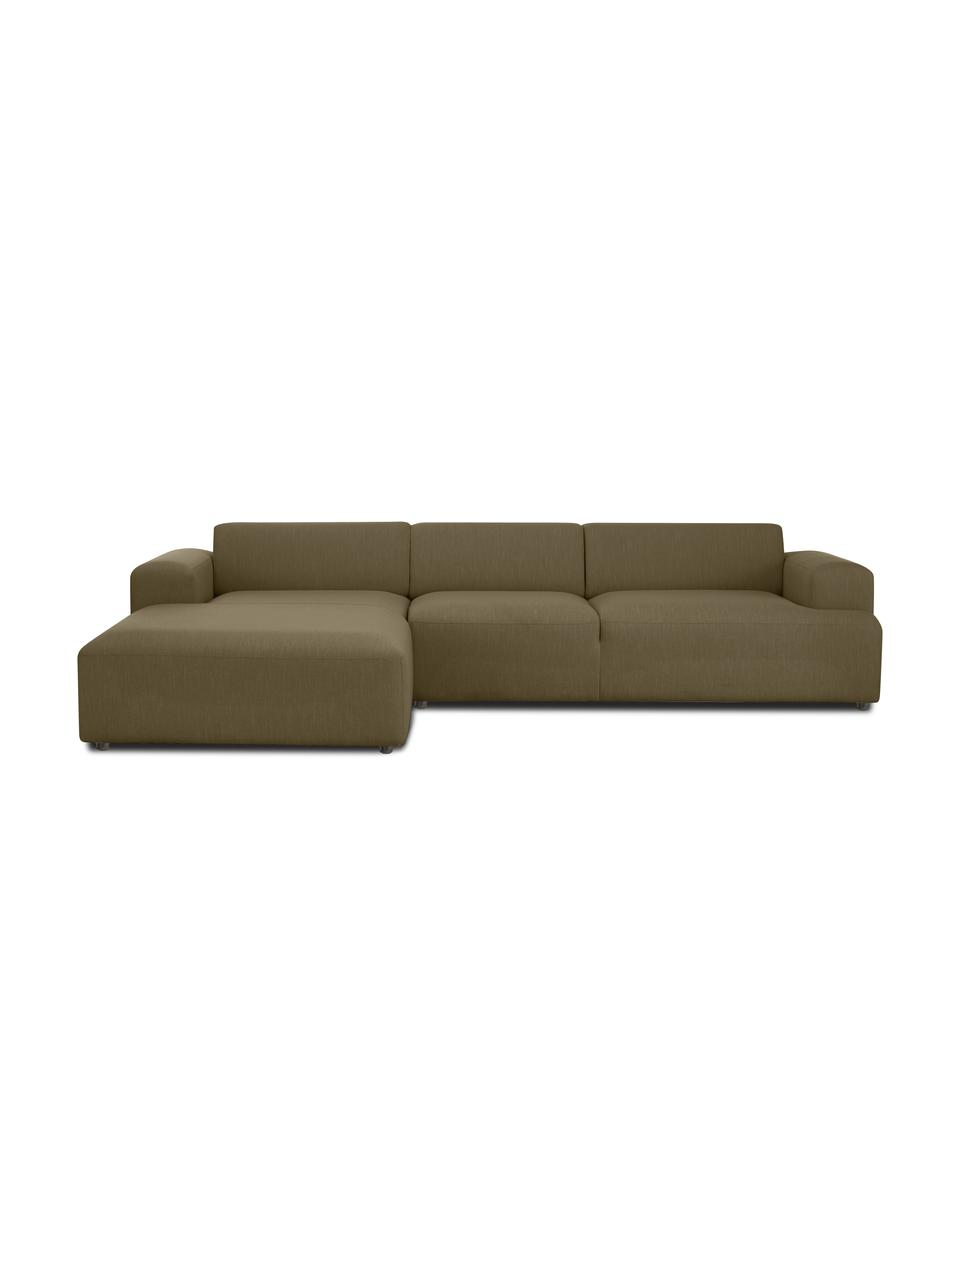 Ecksofa Melva (4-Sitzer) in Olivgrün, Bezug: 100% Polyester Der hochwe, Gestell: Massives Kiefernholz, FSC, Füße: Kunststoff, Webstoff Olivgrün, B 319 x T 196 cm